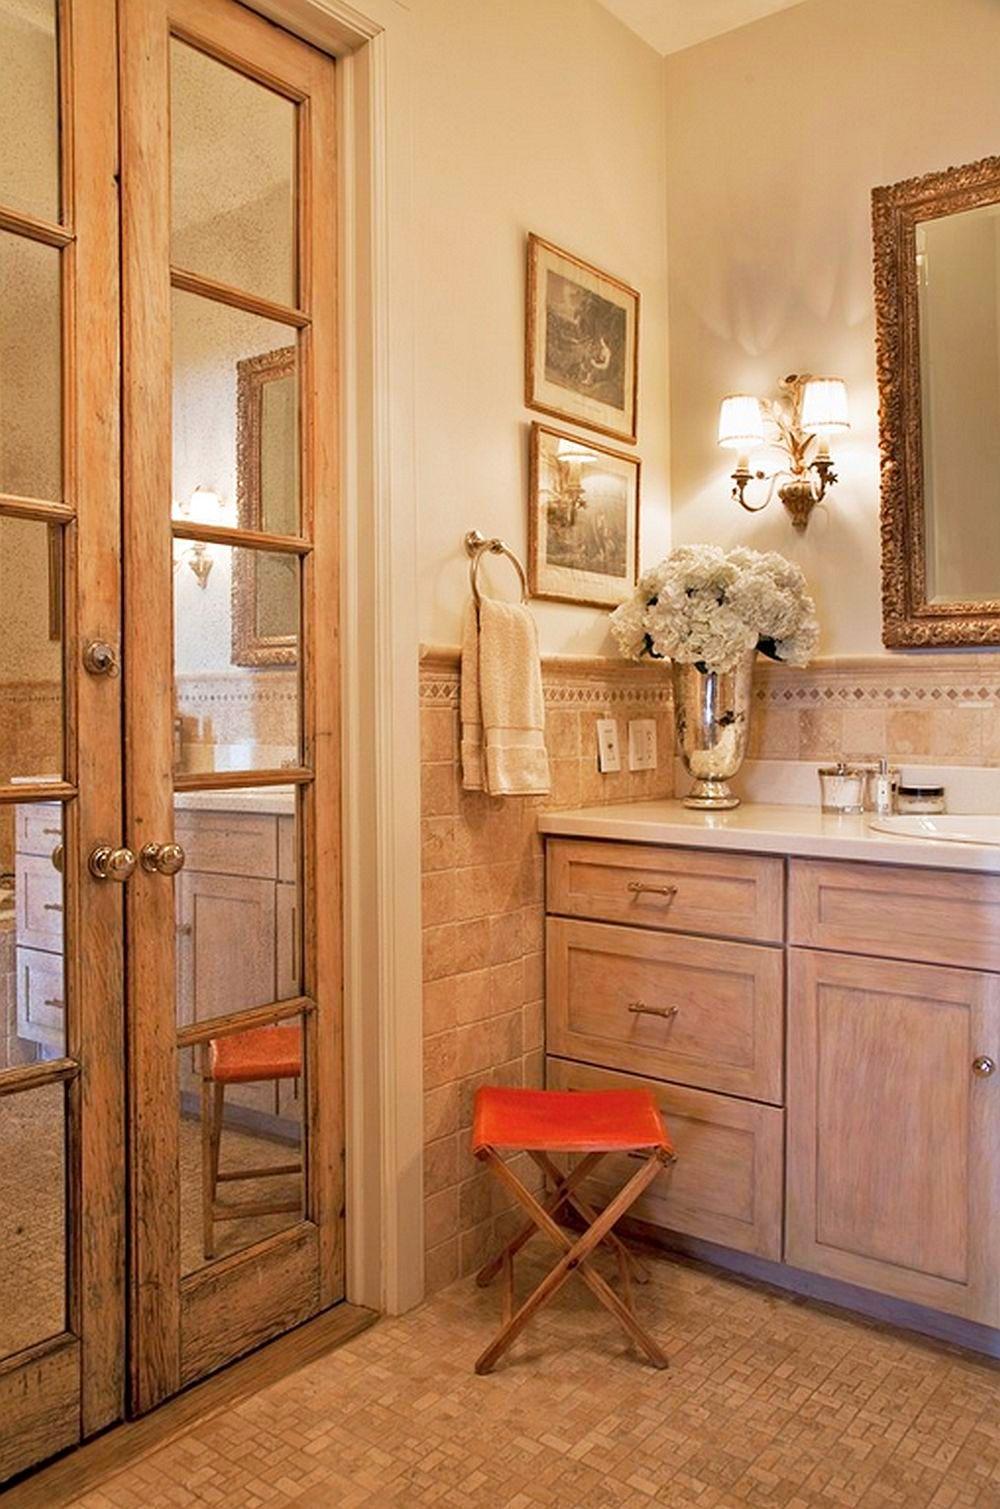 adelaparvu.com despre loft in stil eclectic cu influente marocane, morrocan style, designer Deborah French, Foto Yiorgos Kordakis (12)